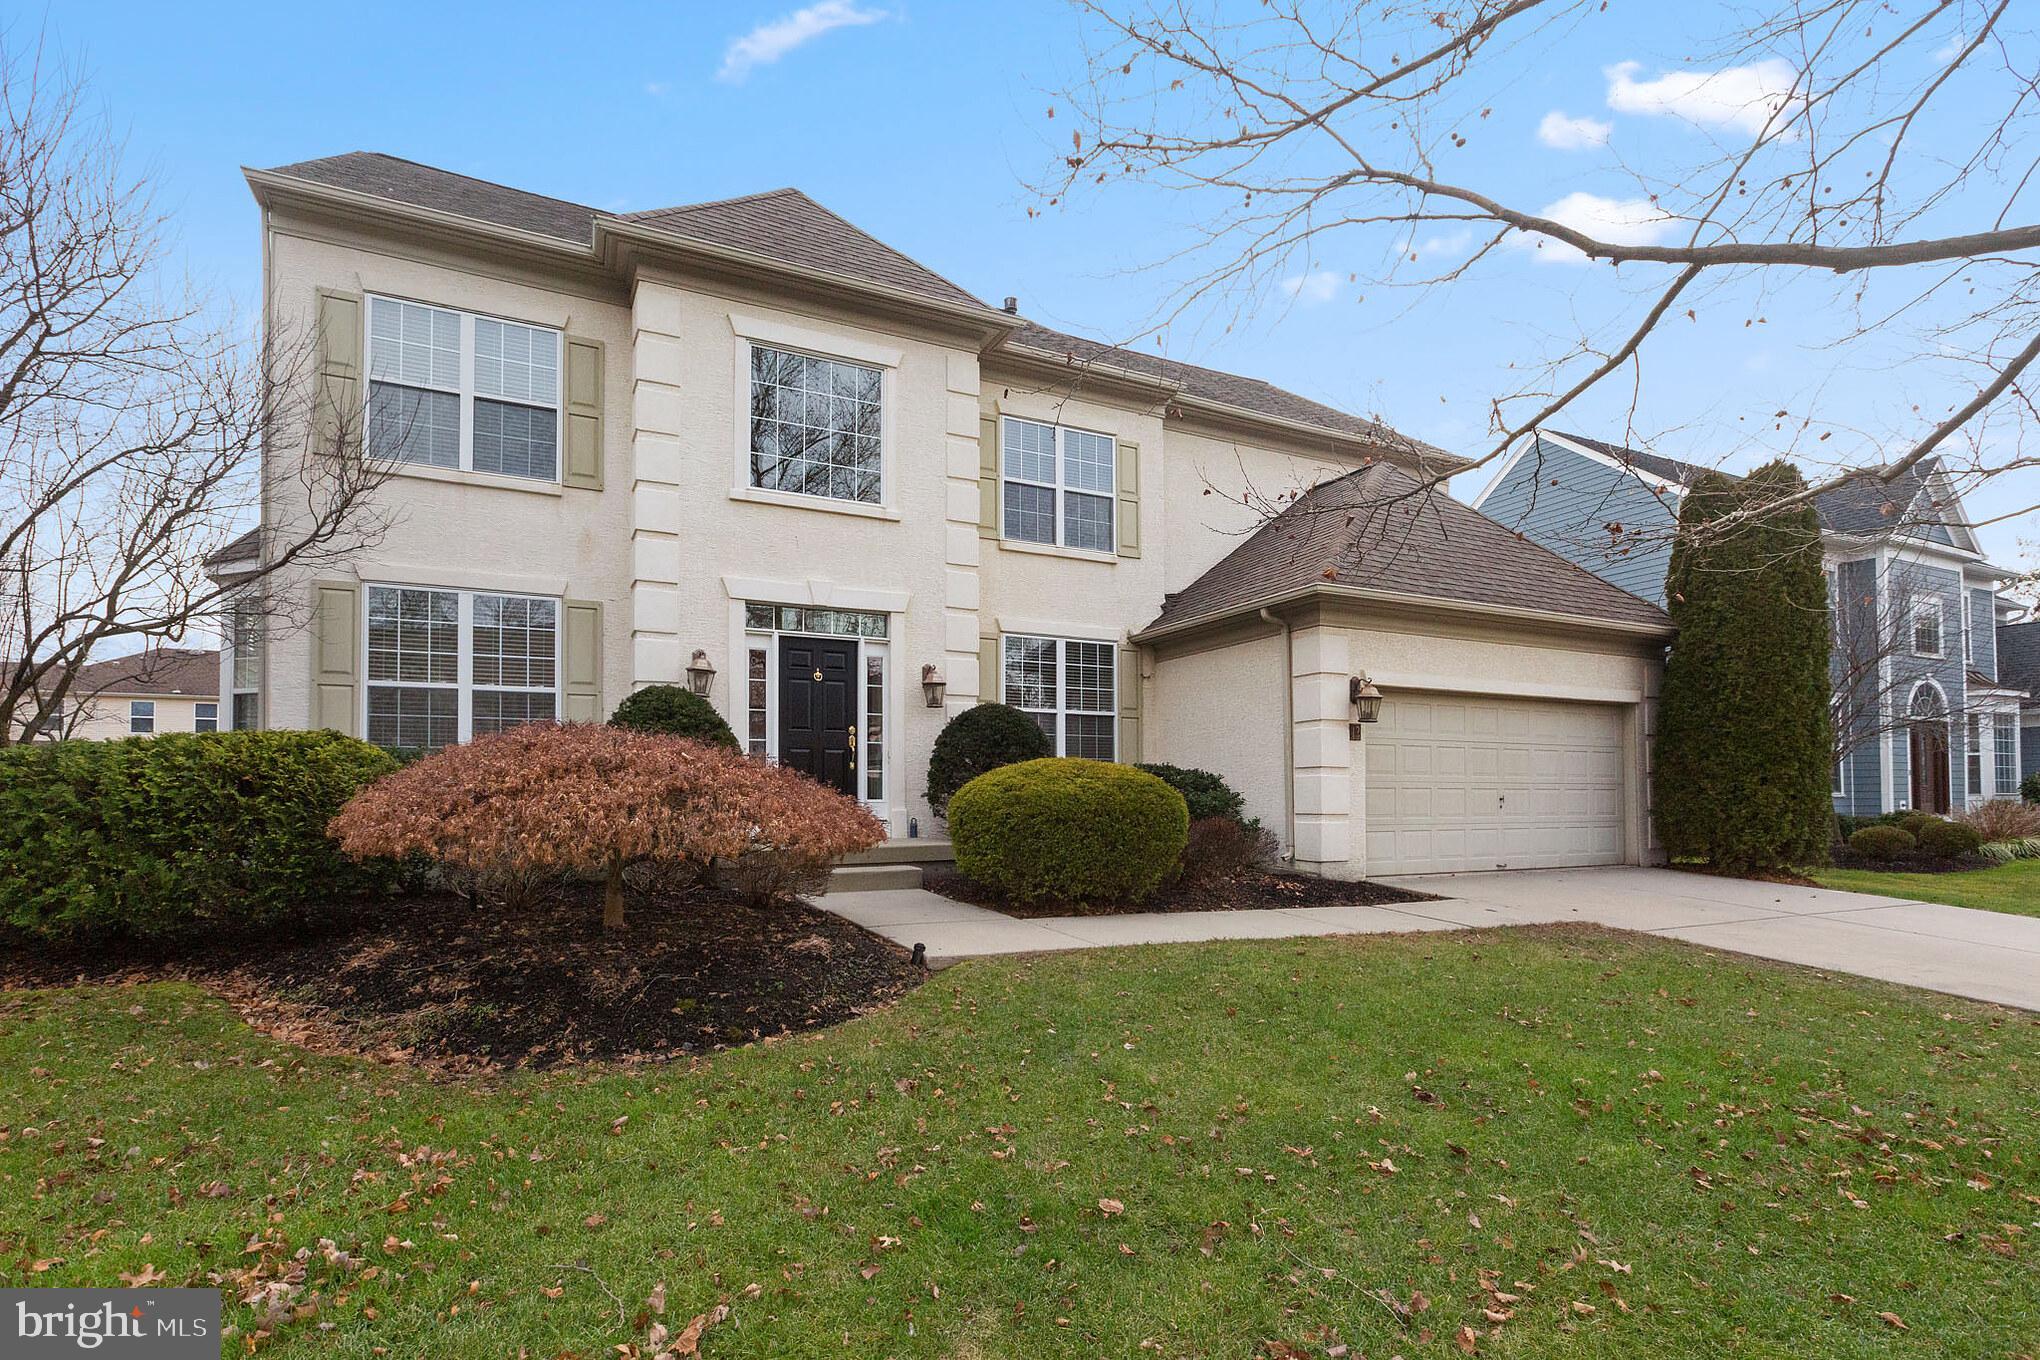 12 MANOR HOUSE DRIVE, CHERRY HILL, NJ 08003